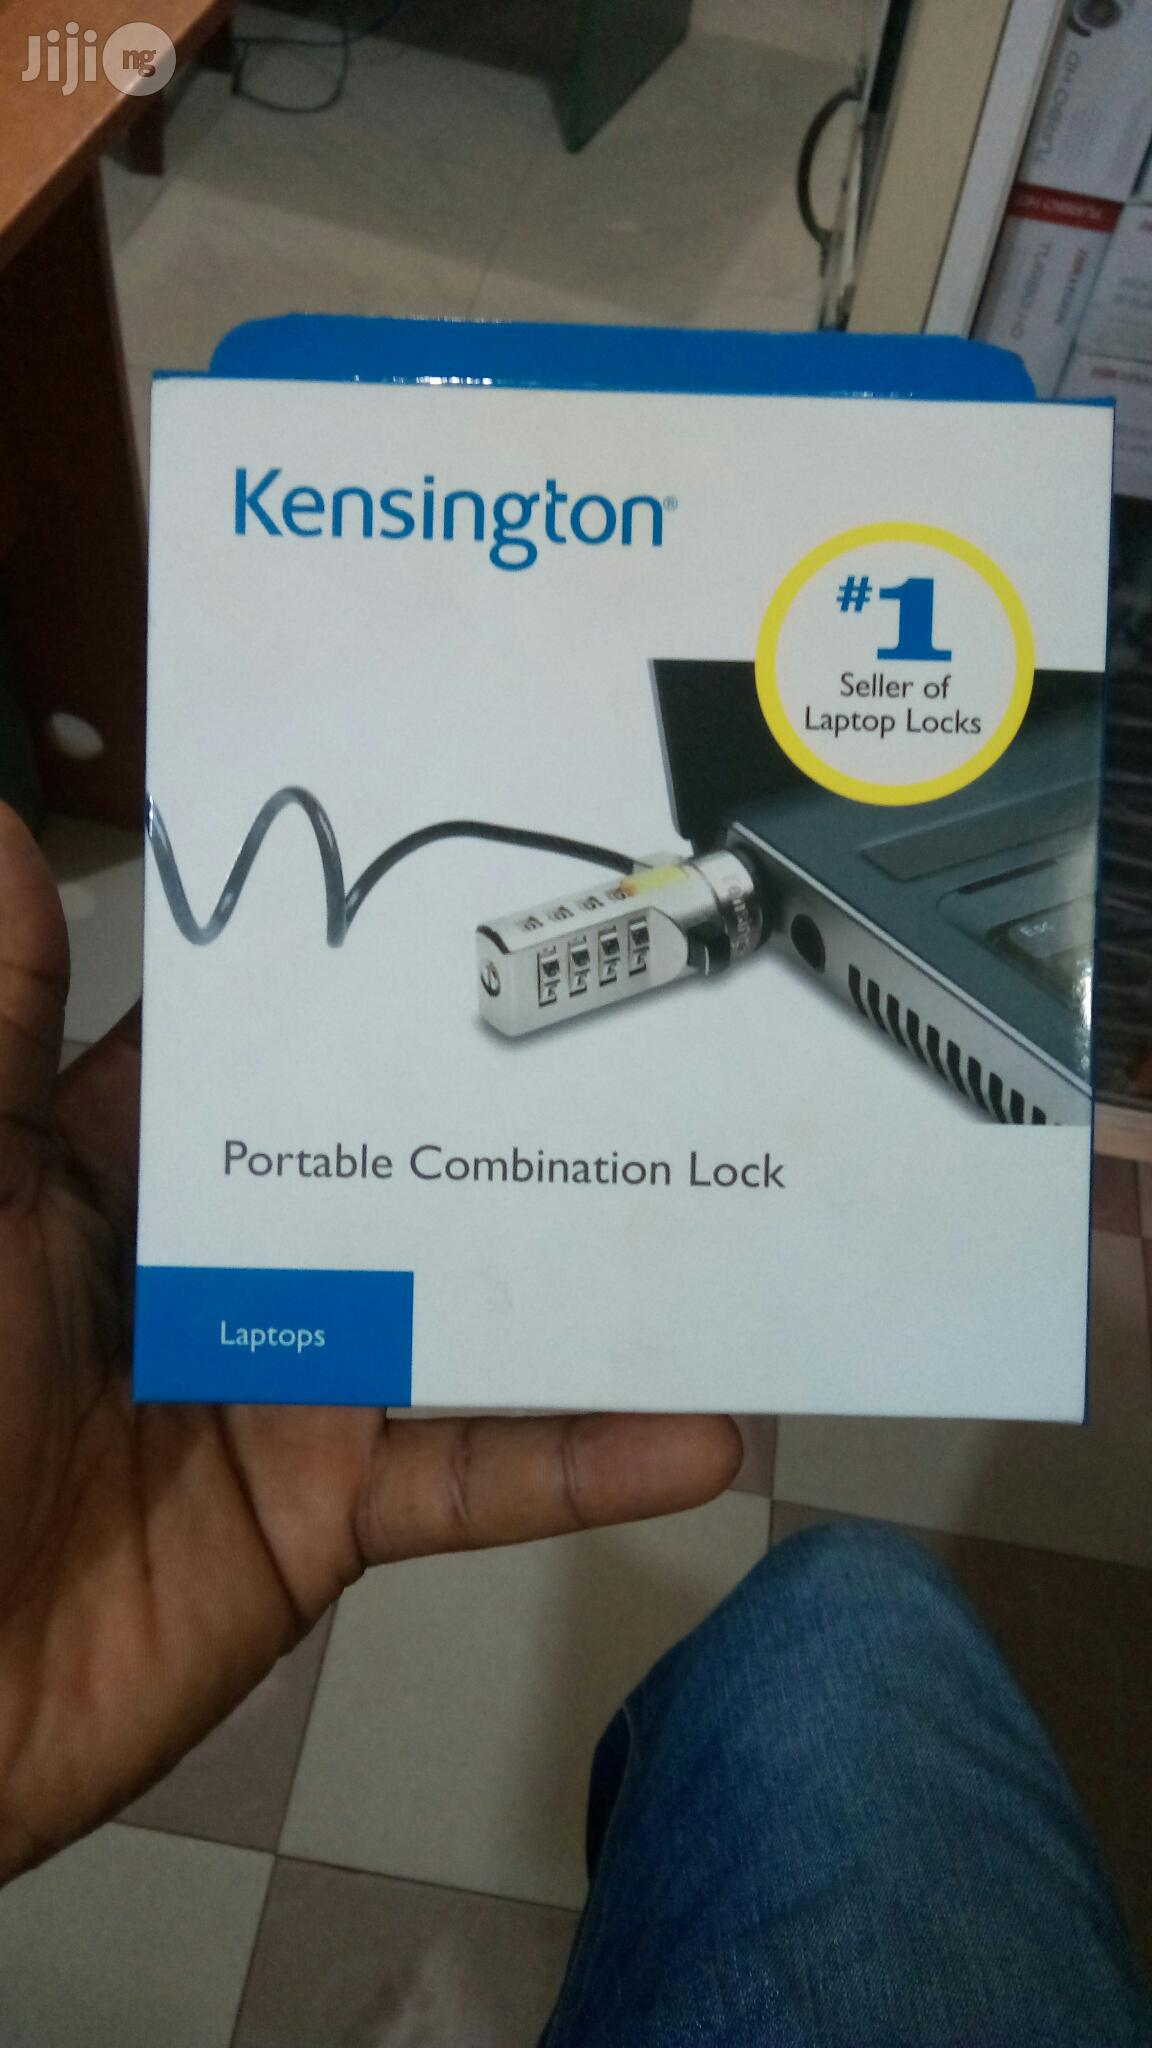 Kensington Laptop Lock Portable Combination Lock